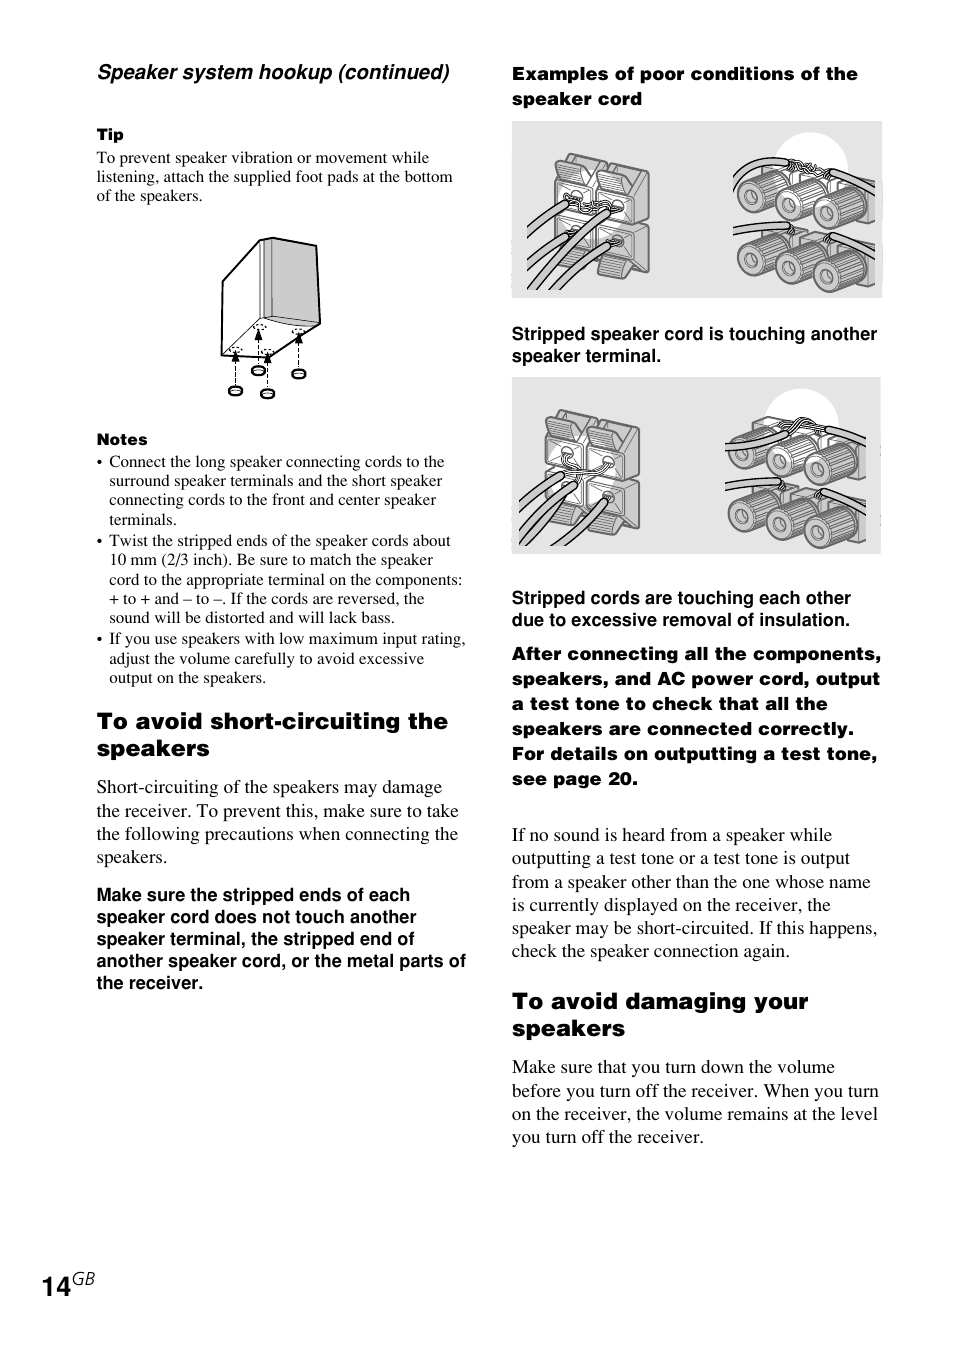 sony str k740p user manual page 14 59 original mode also for rh manualsdir com sony str k740p user's manual sony receiver str-k740p manual